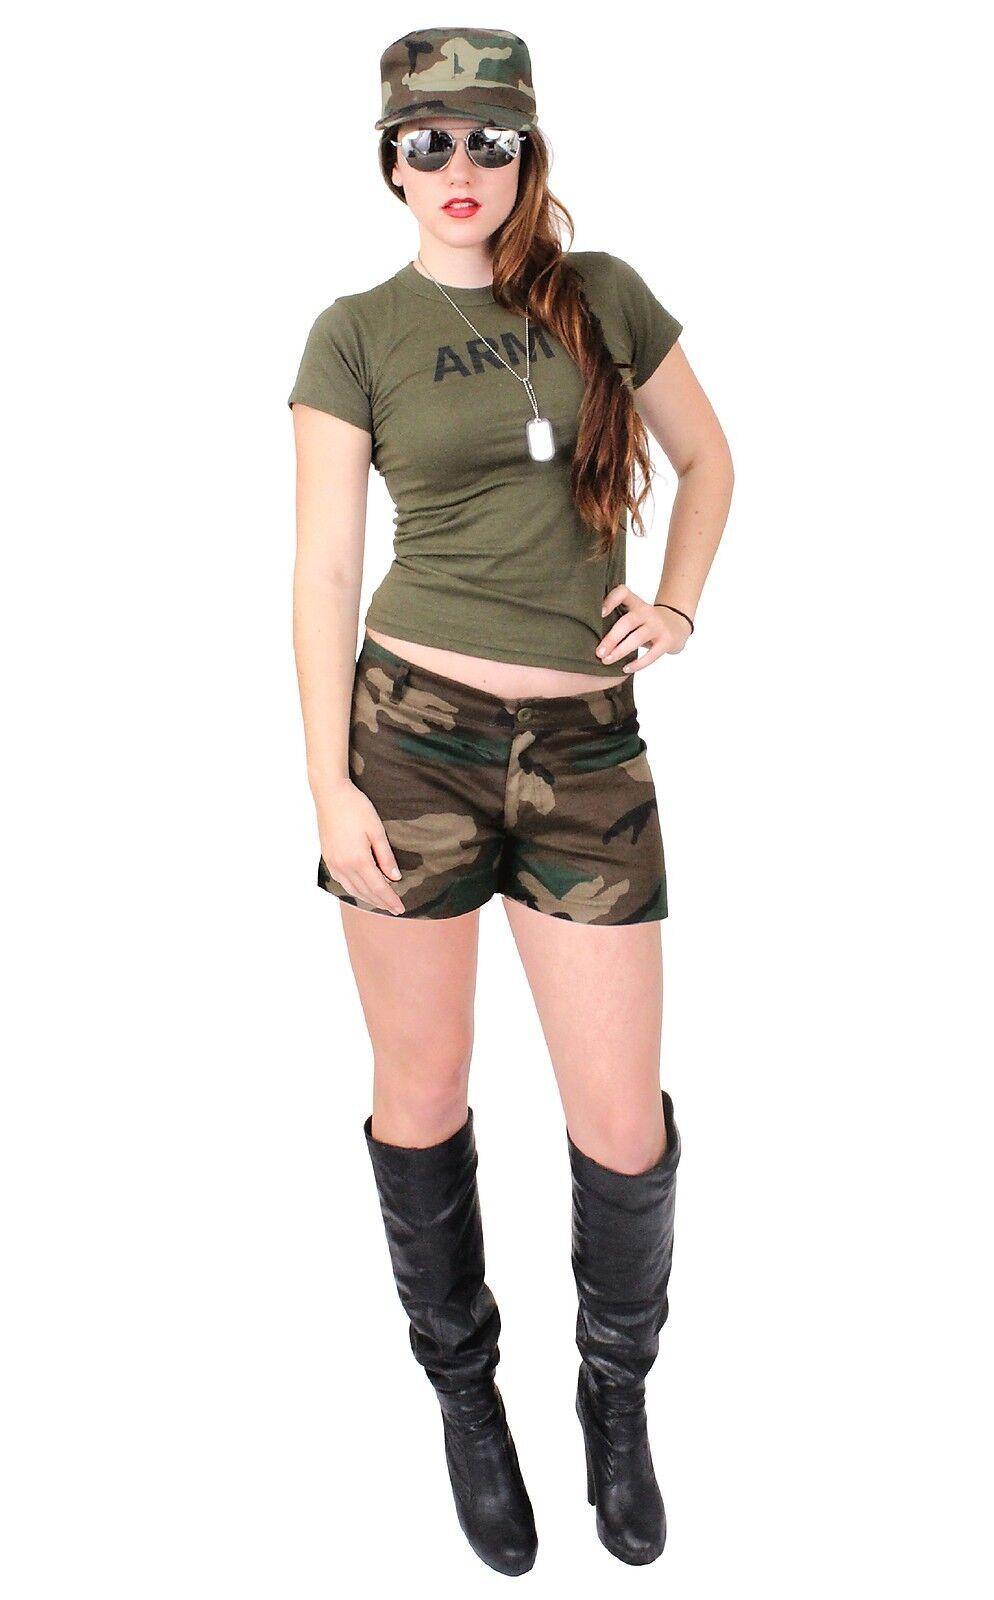 Hot Army Chicks